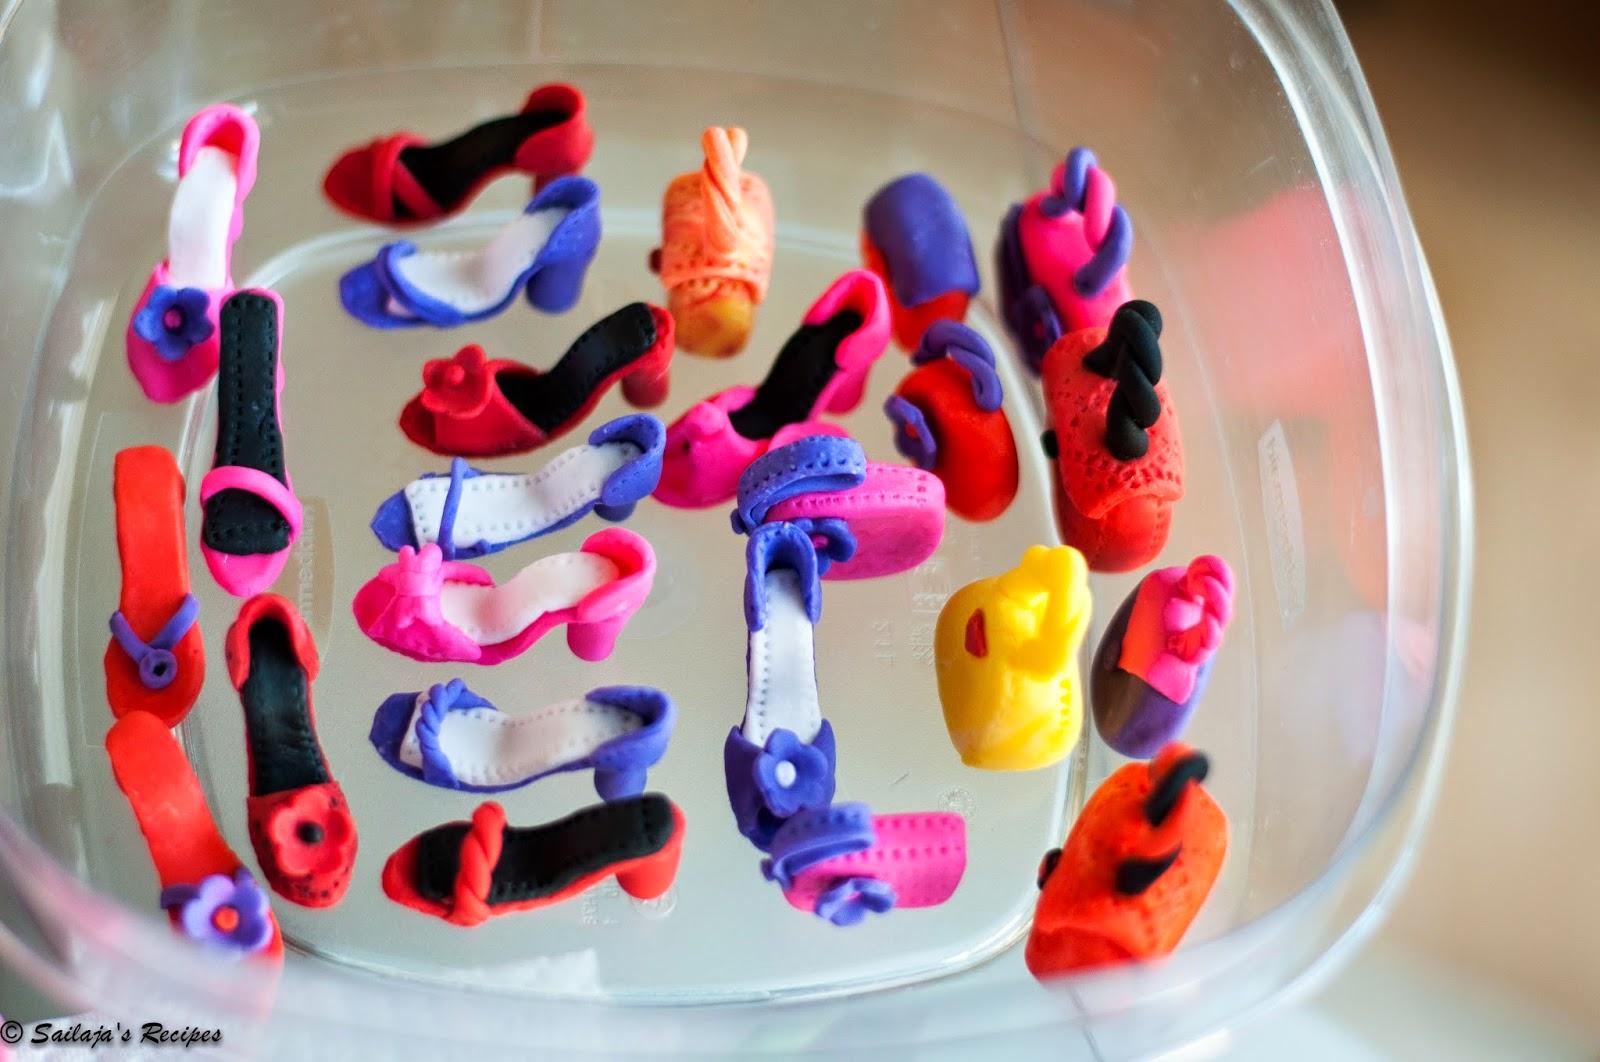 sailaja s recipes cupcakes with high heel shoe and purse